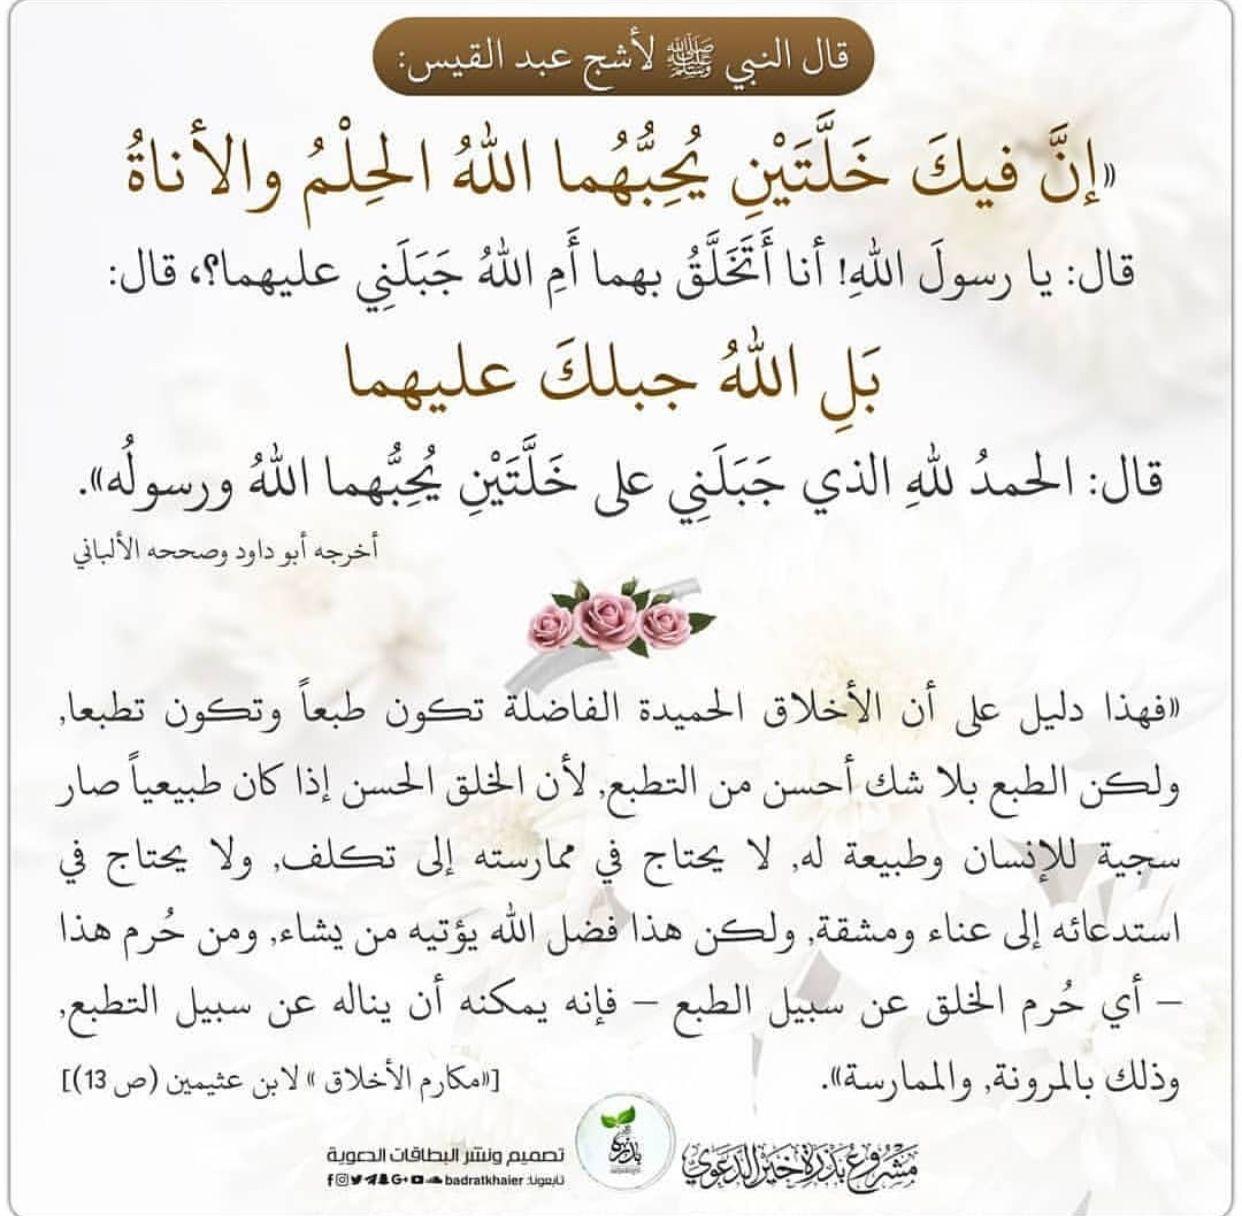 Pin By Modhi Light On احاديث الرسول ﷺ Arabic Calligraphy Calligraphy Hadith